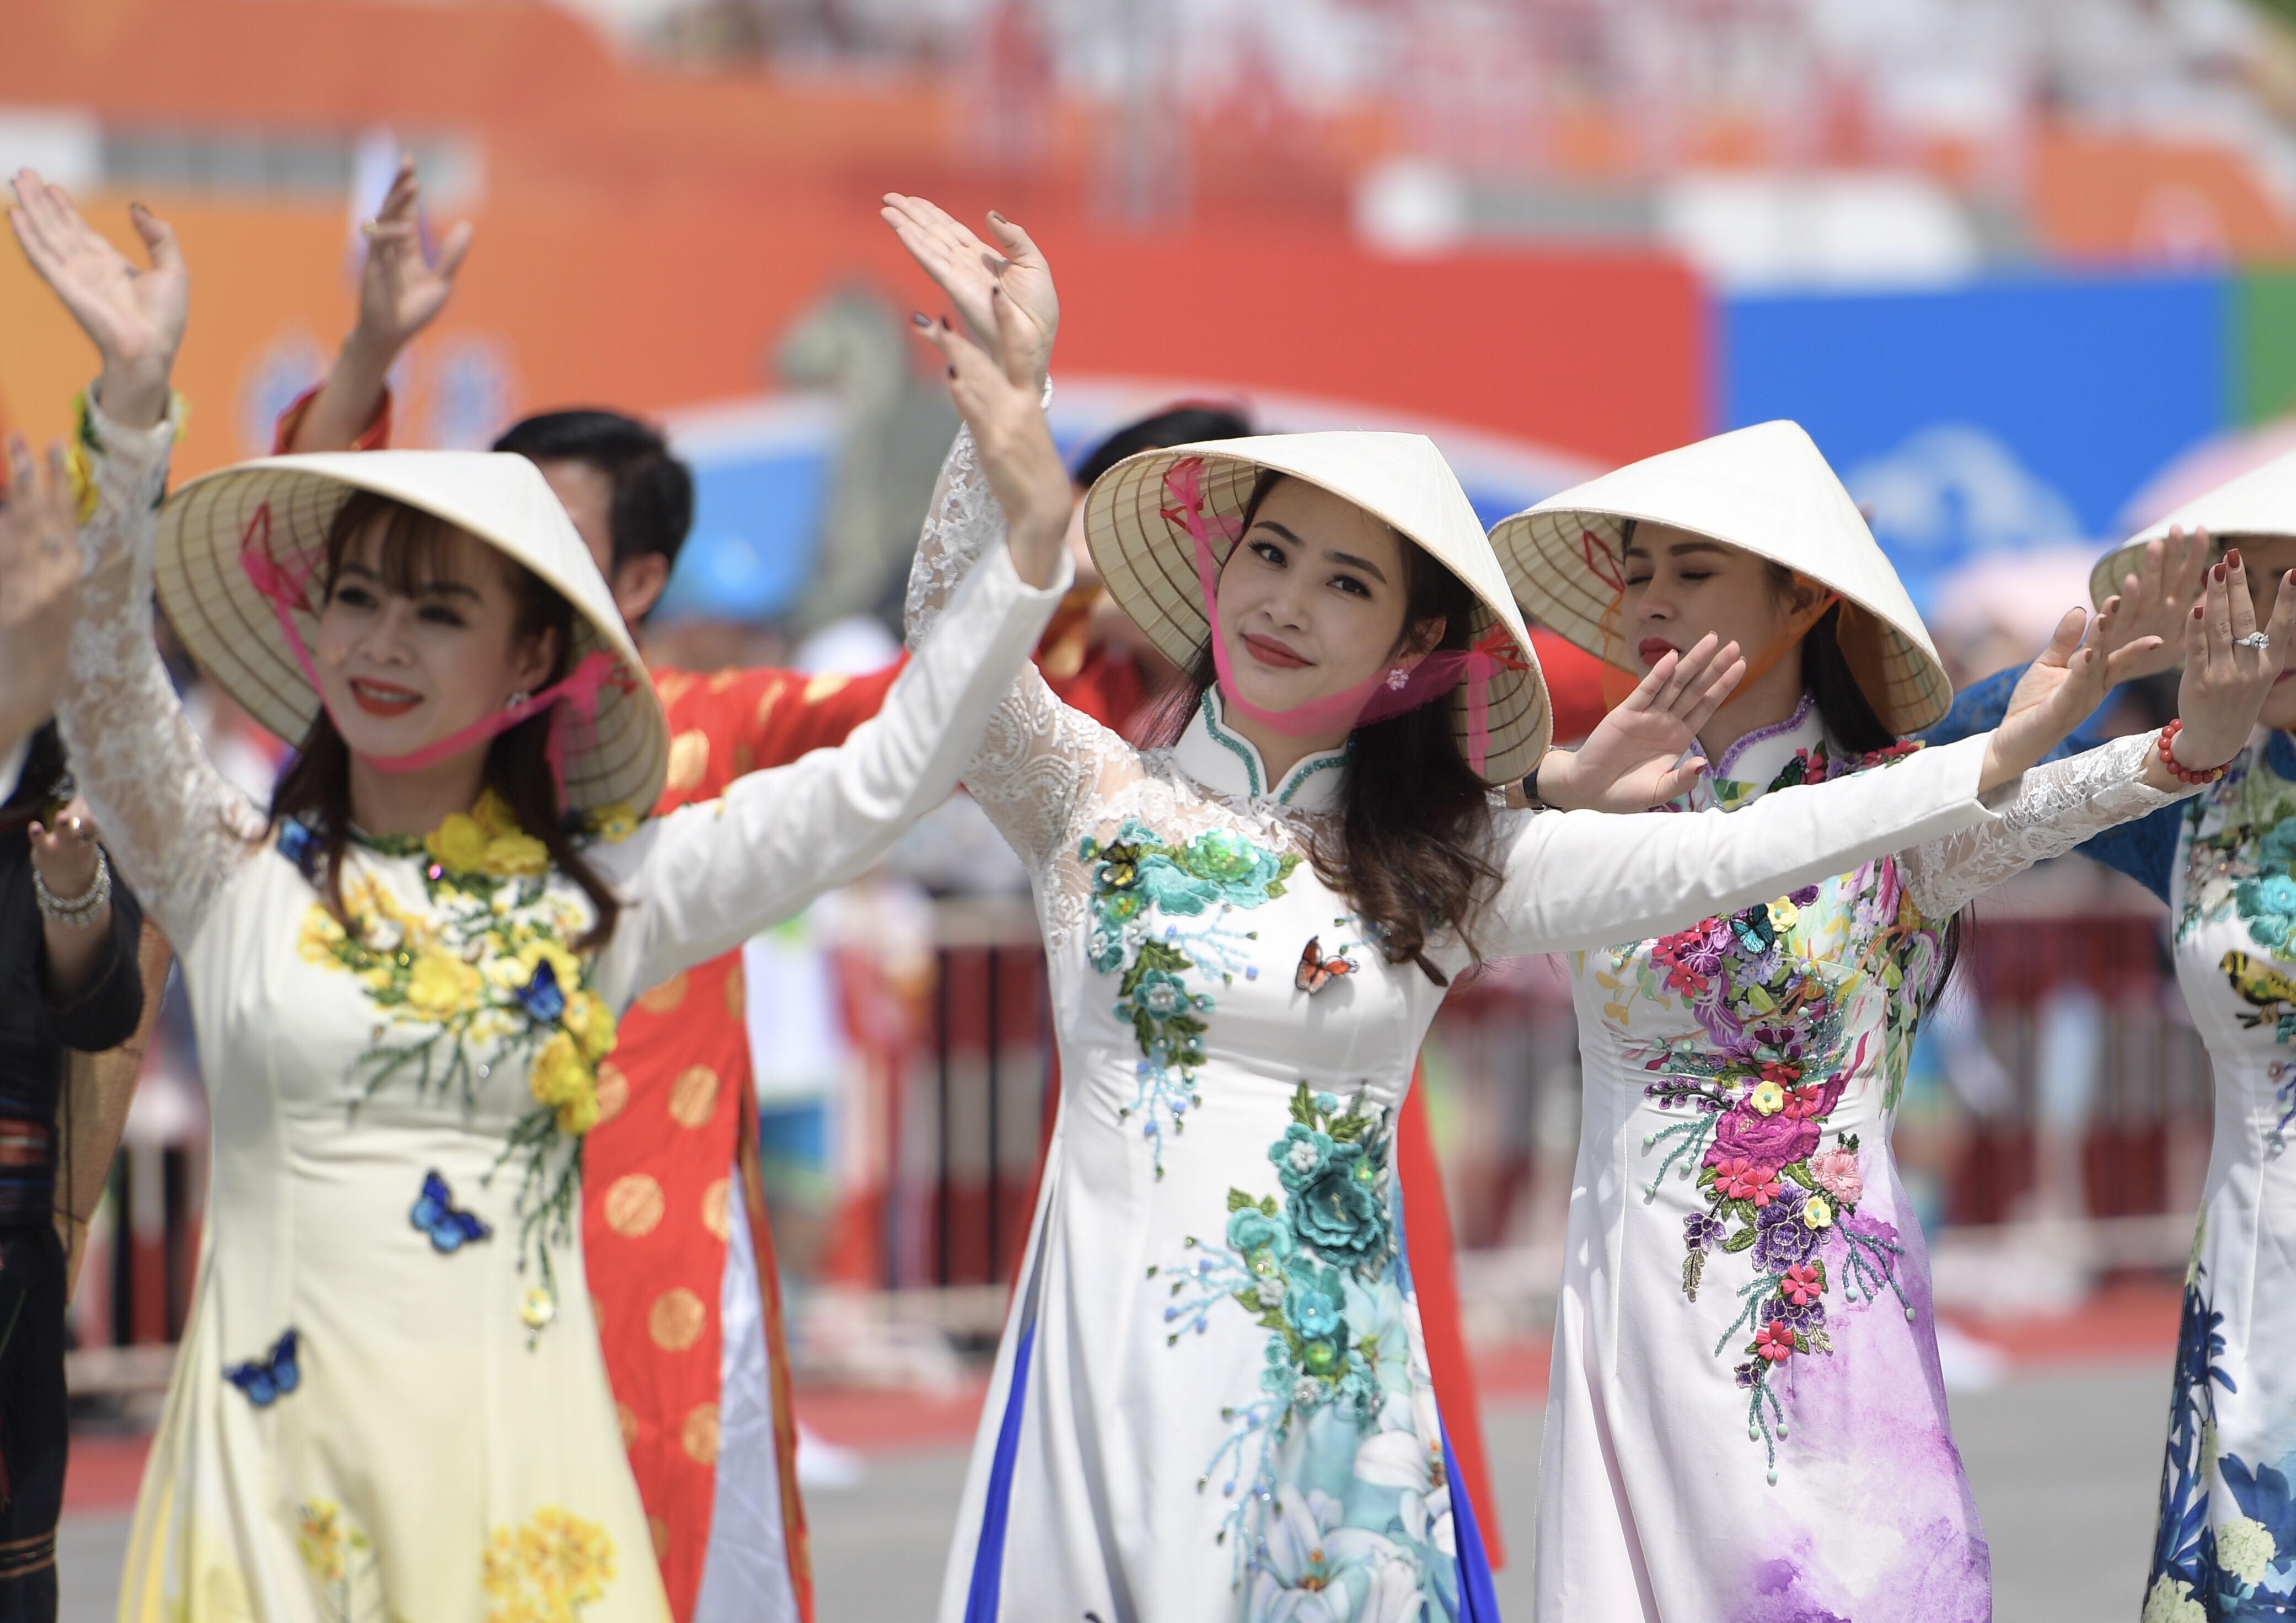 Interview: China, Vietnam should promote sound, stable development of relationship, says ambassador - Xinhua | English.news.cn